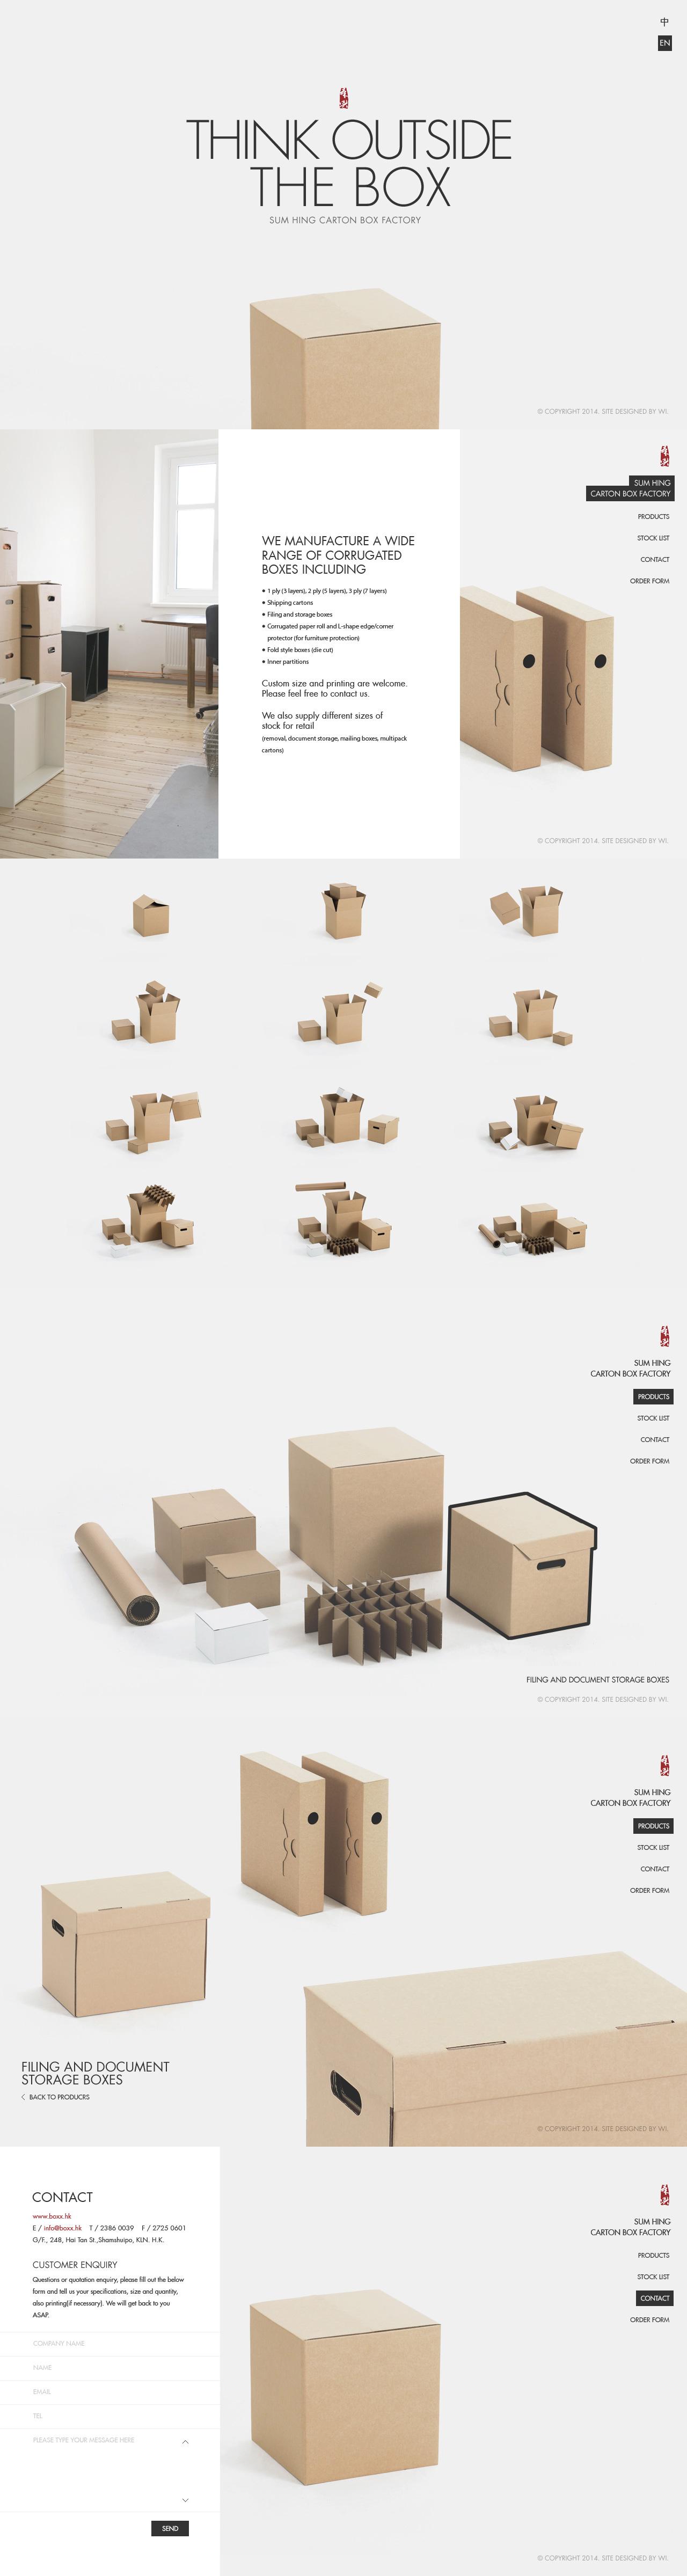 Sum Hing Carton Box Factory Website Screenshot